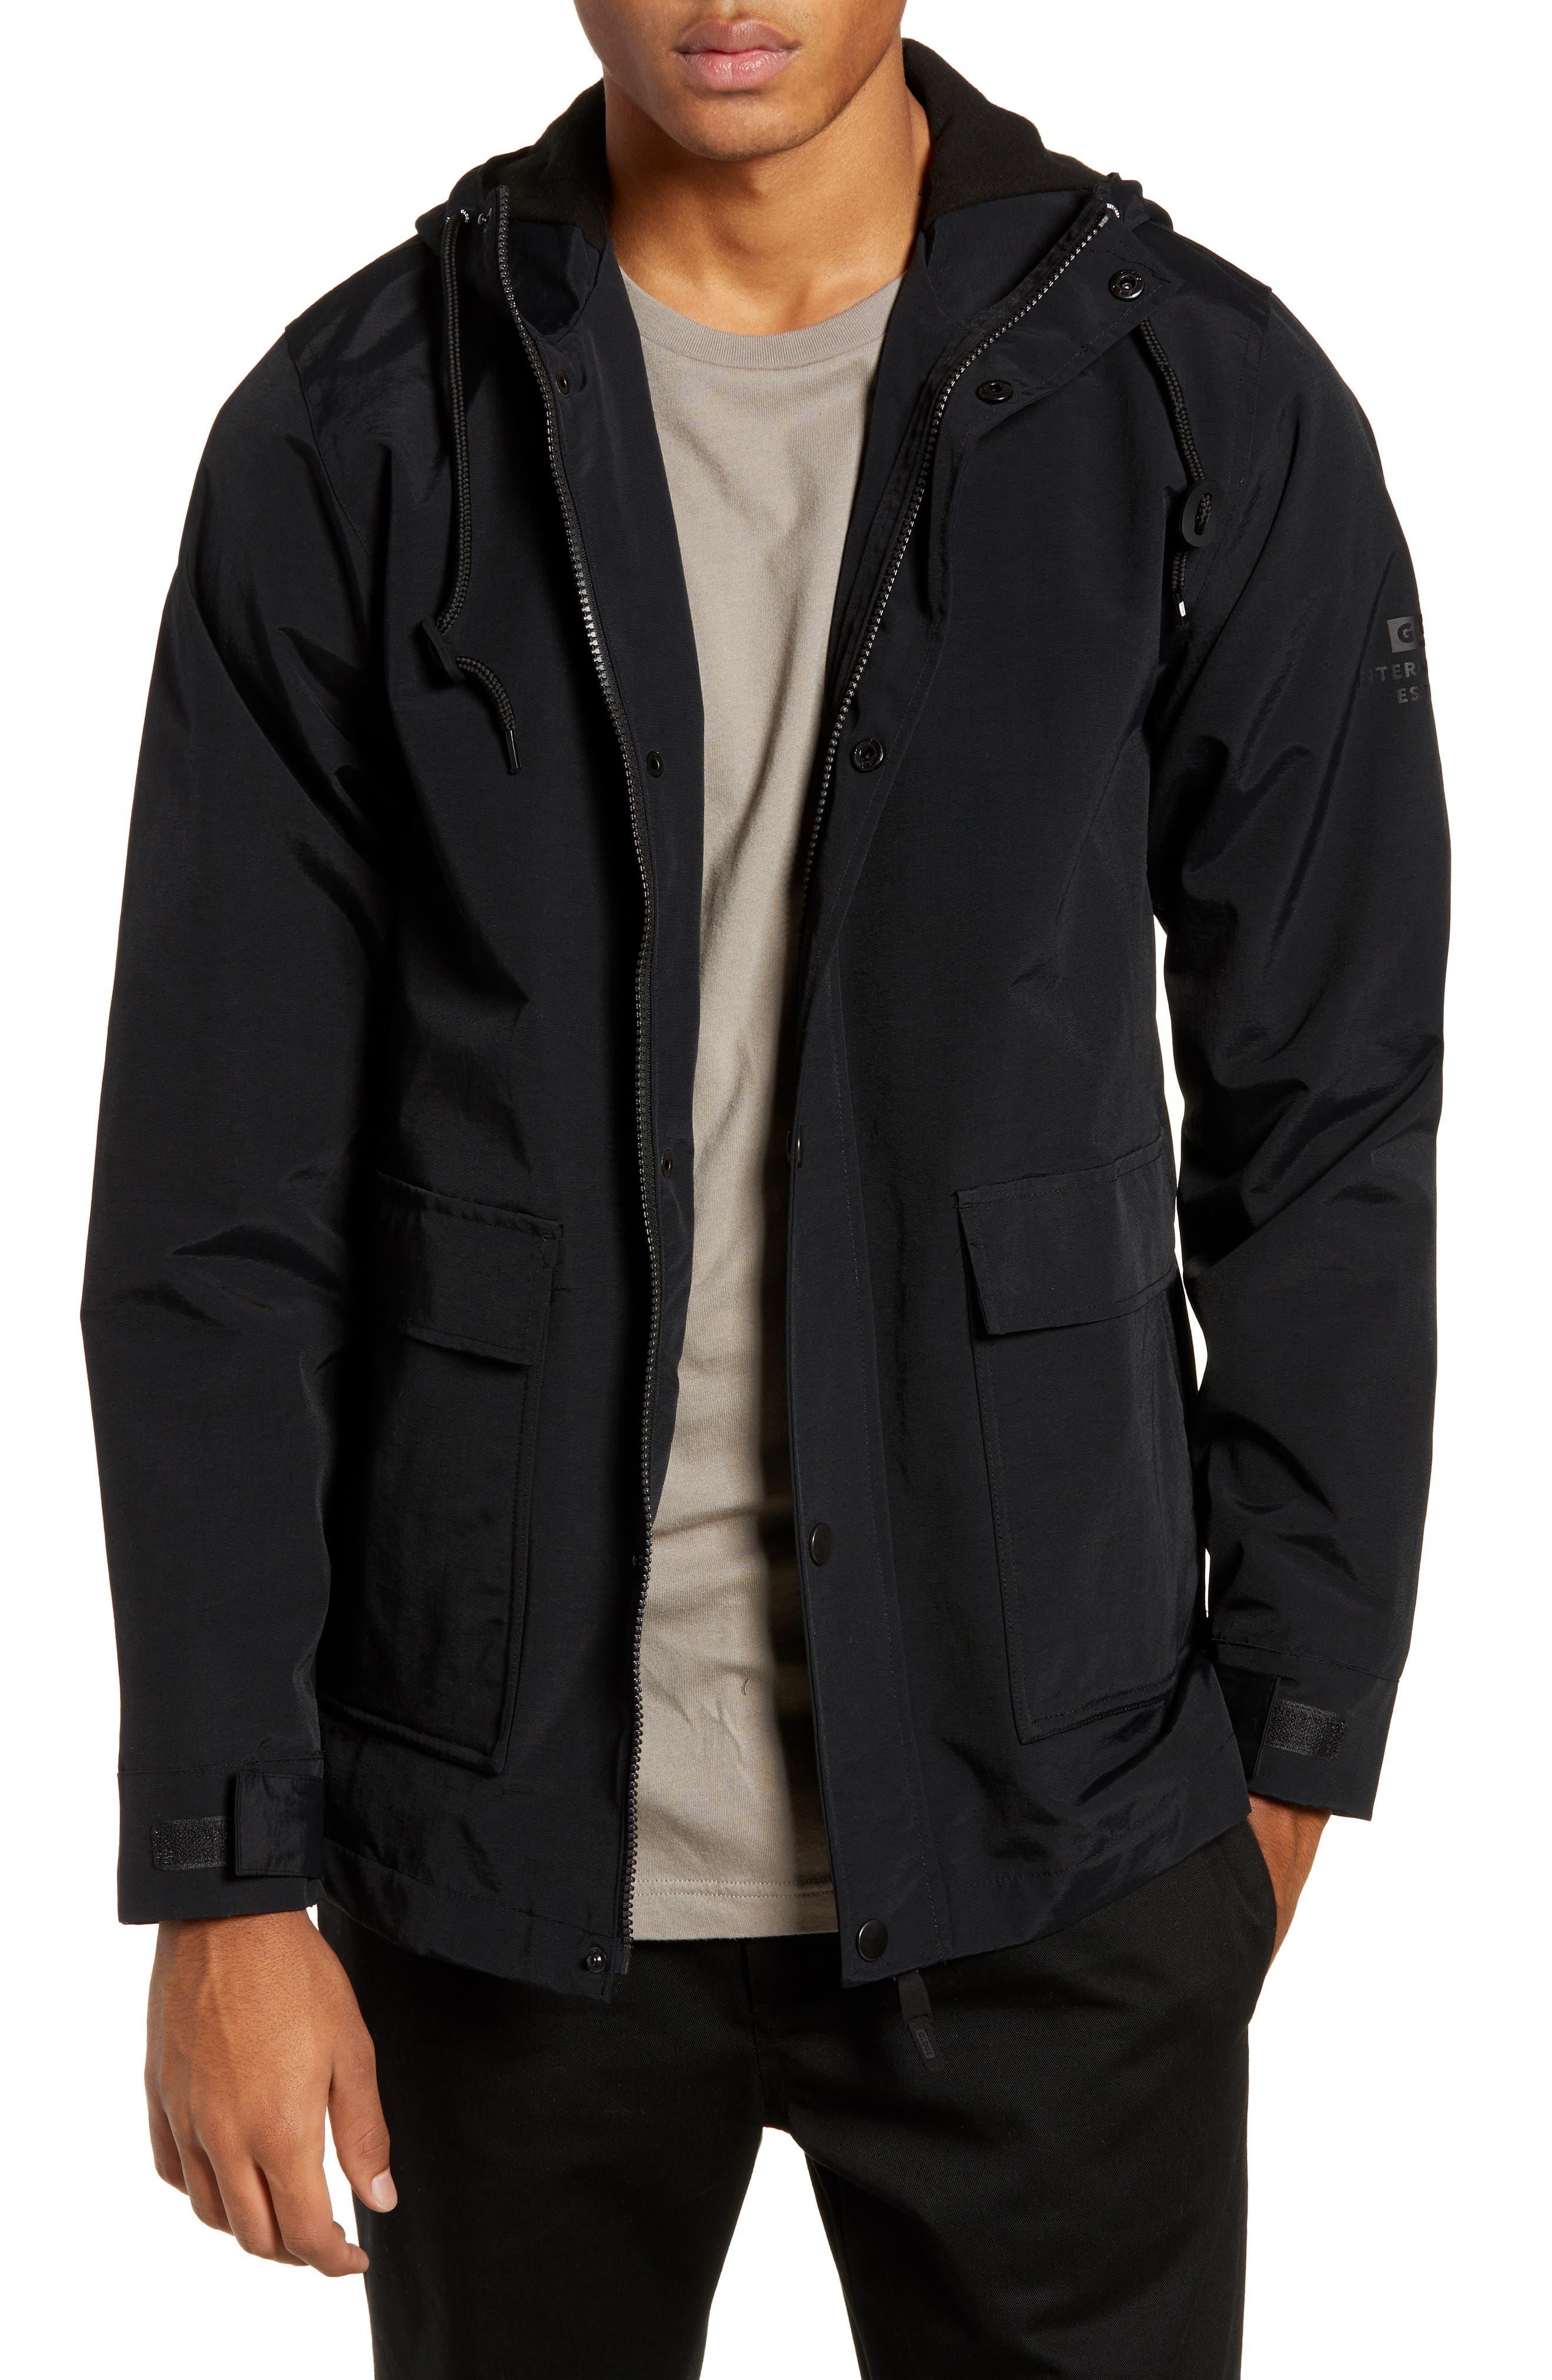 Goodstock Utility Jacket,                         Main,                         color, BLACK